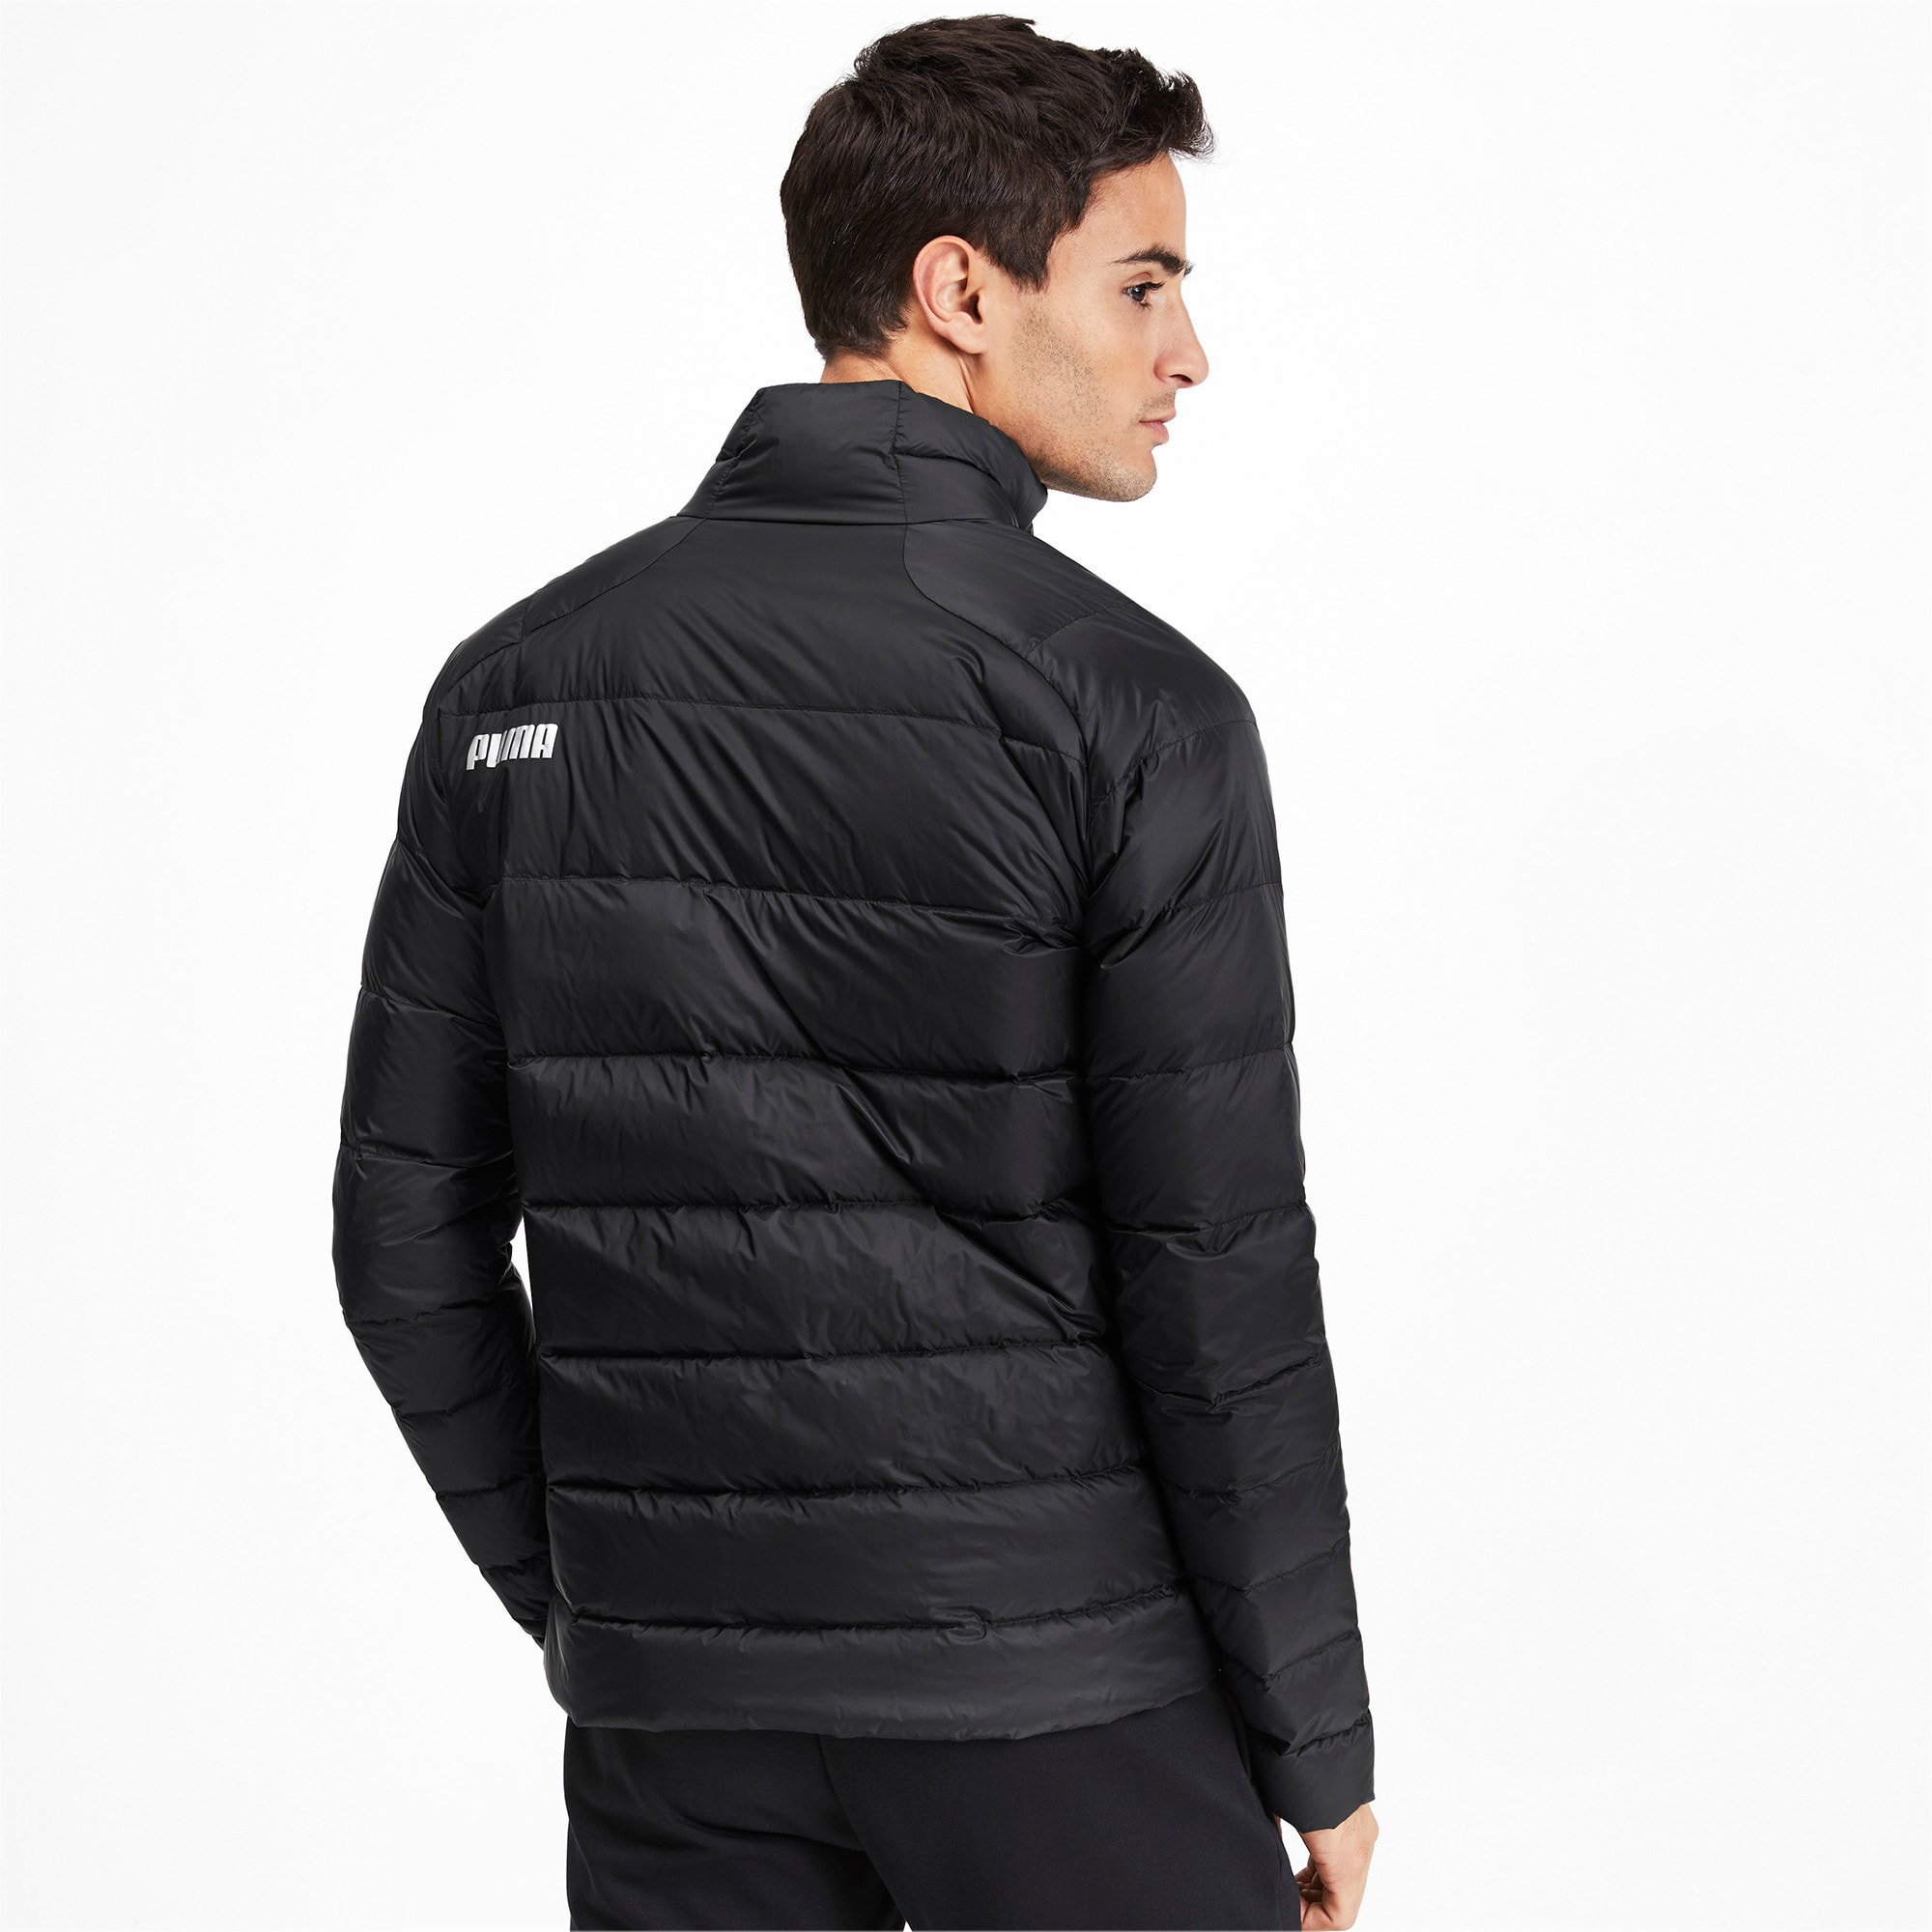 Thumbnail 2 of PWRWarm packLITE 600 Down Men's Jacket, Puma Black, medium